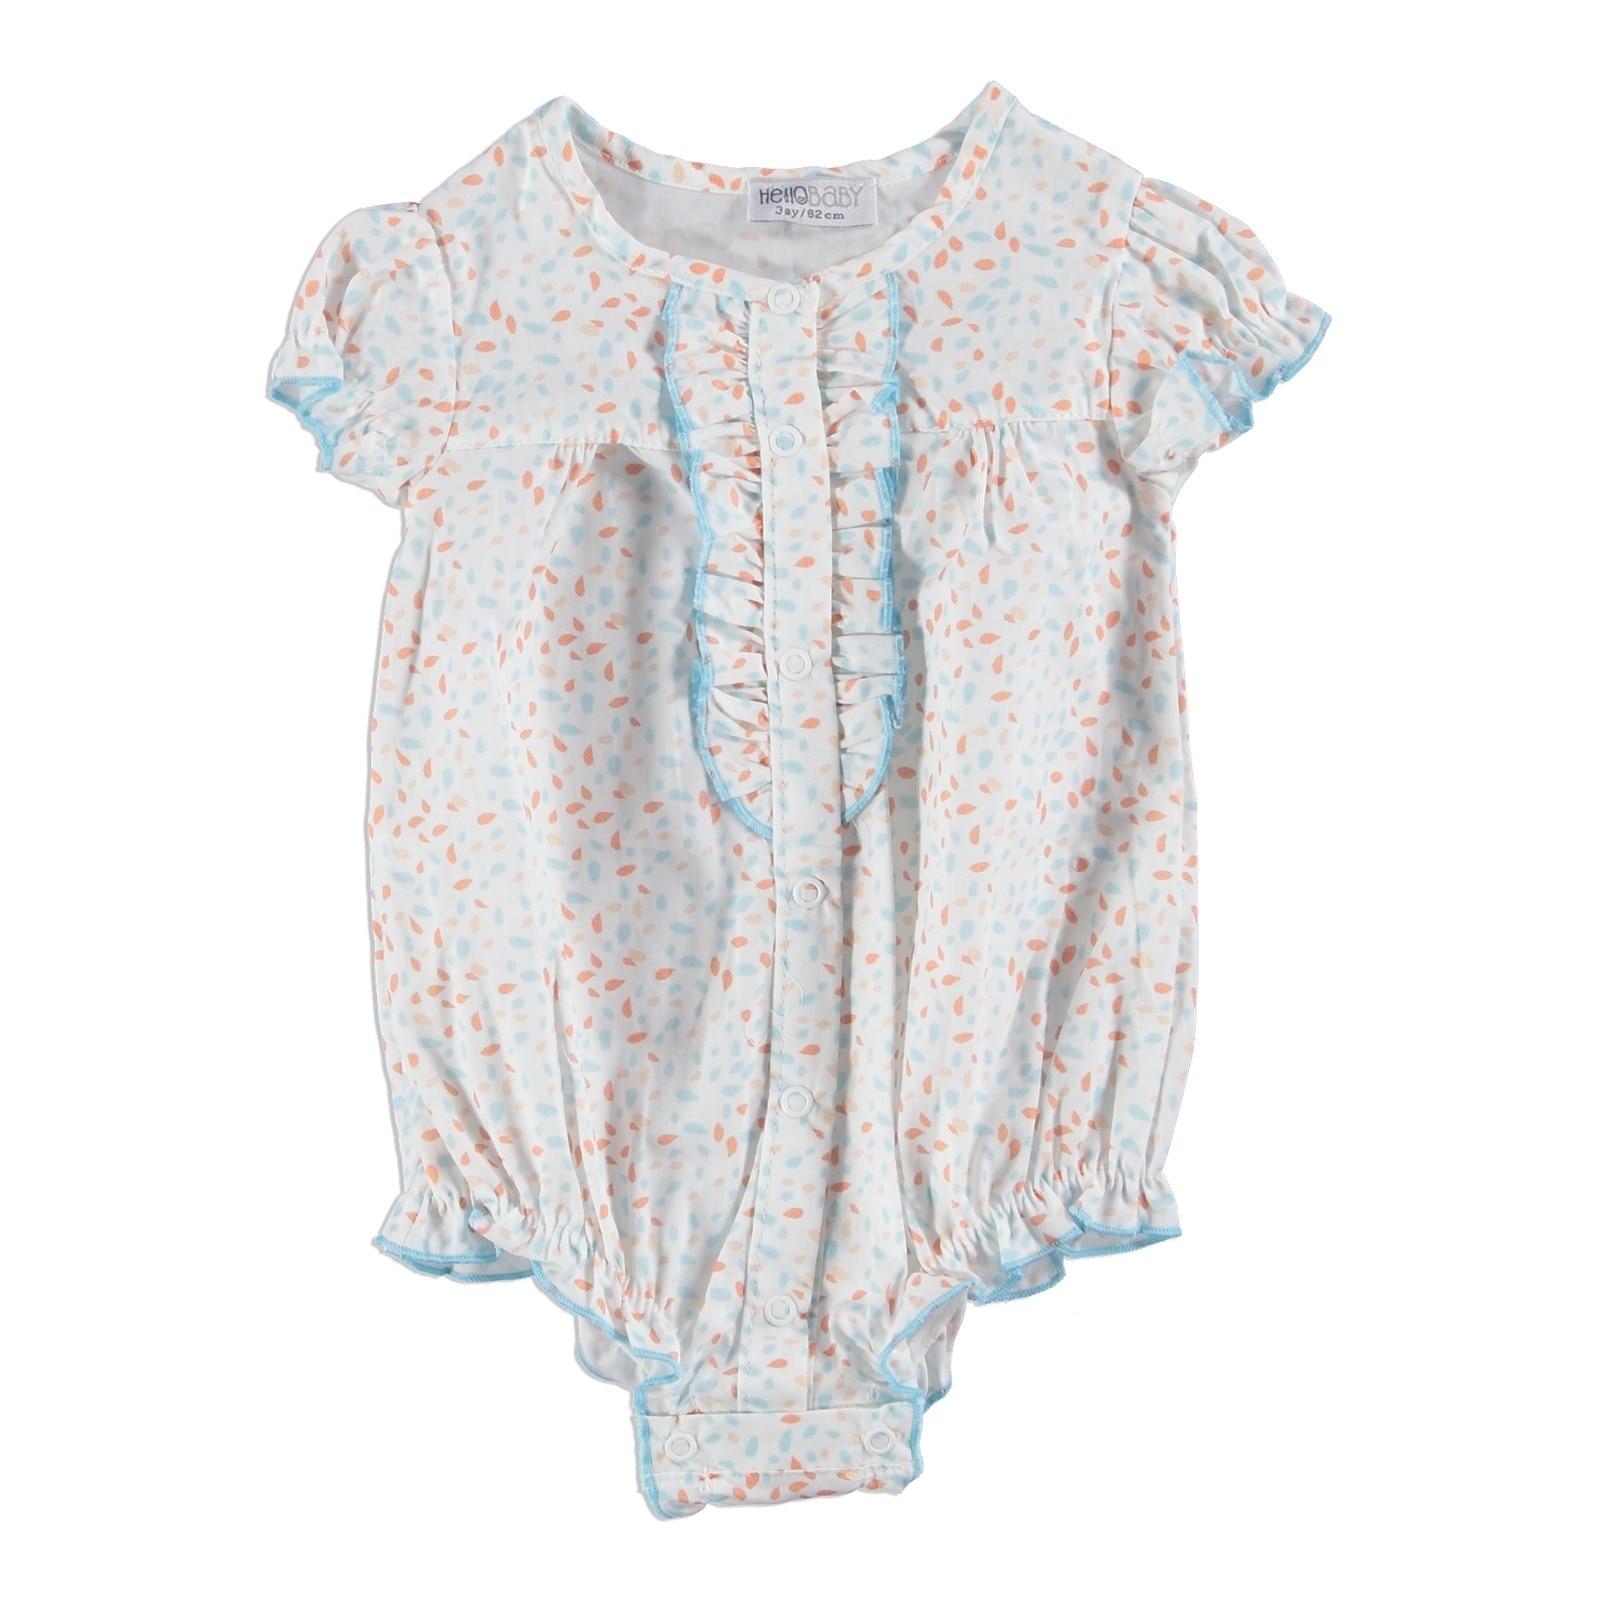 Ebebek HelloBaby Baby Shirt Bodysuit For Girls & Boys